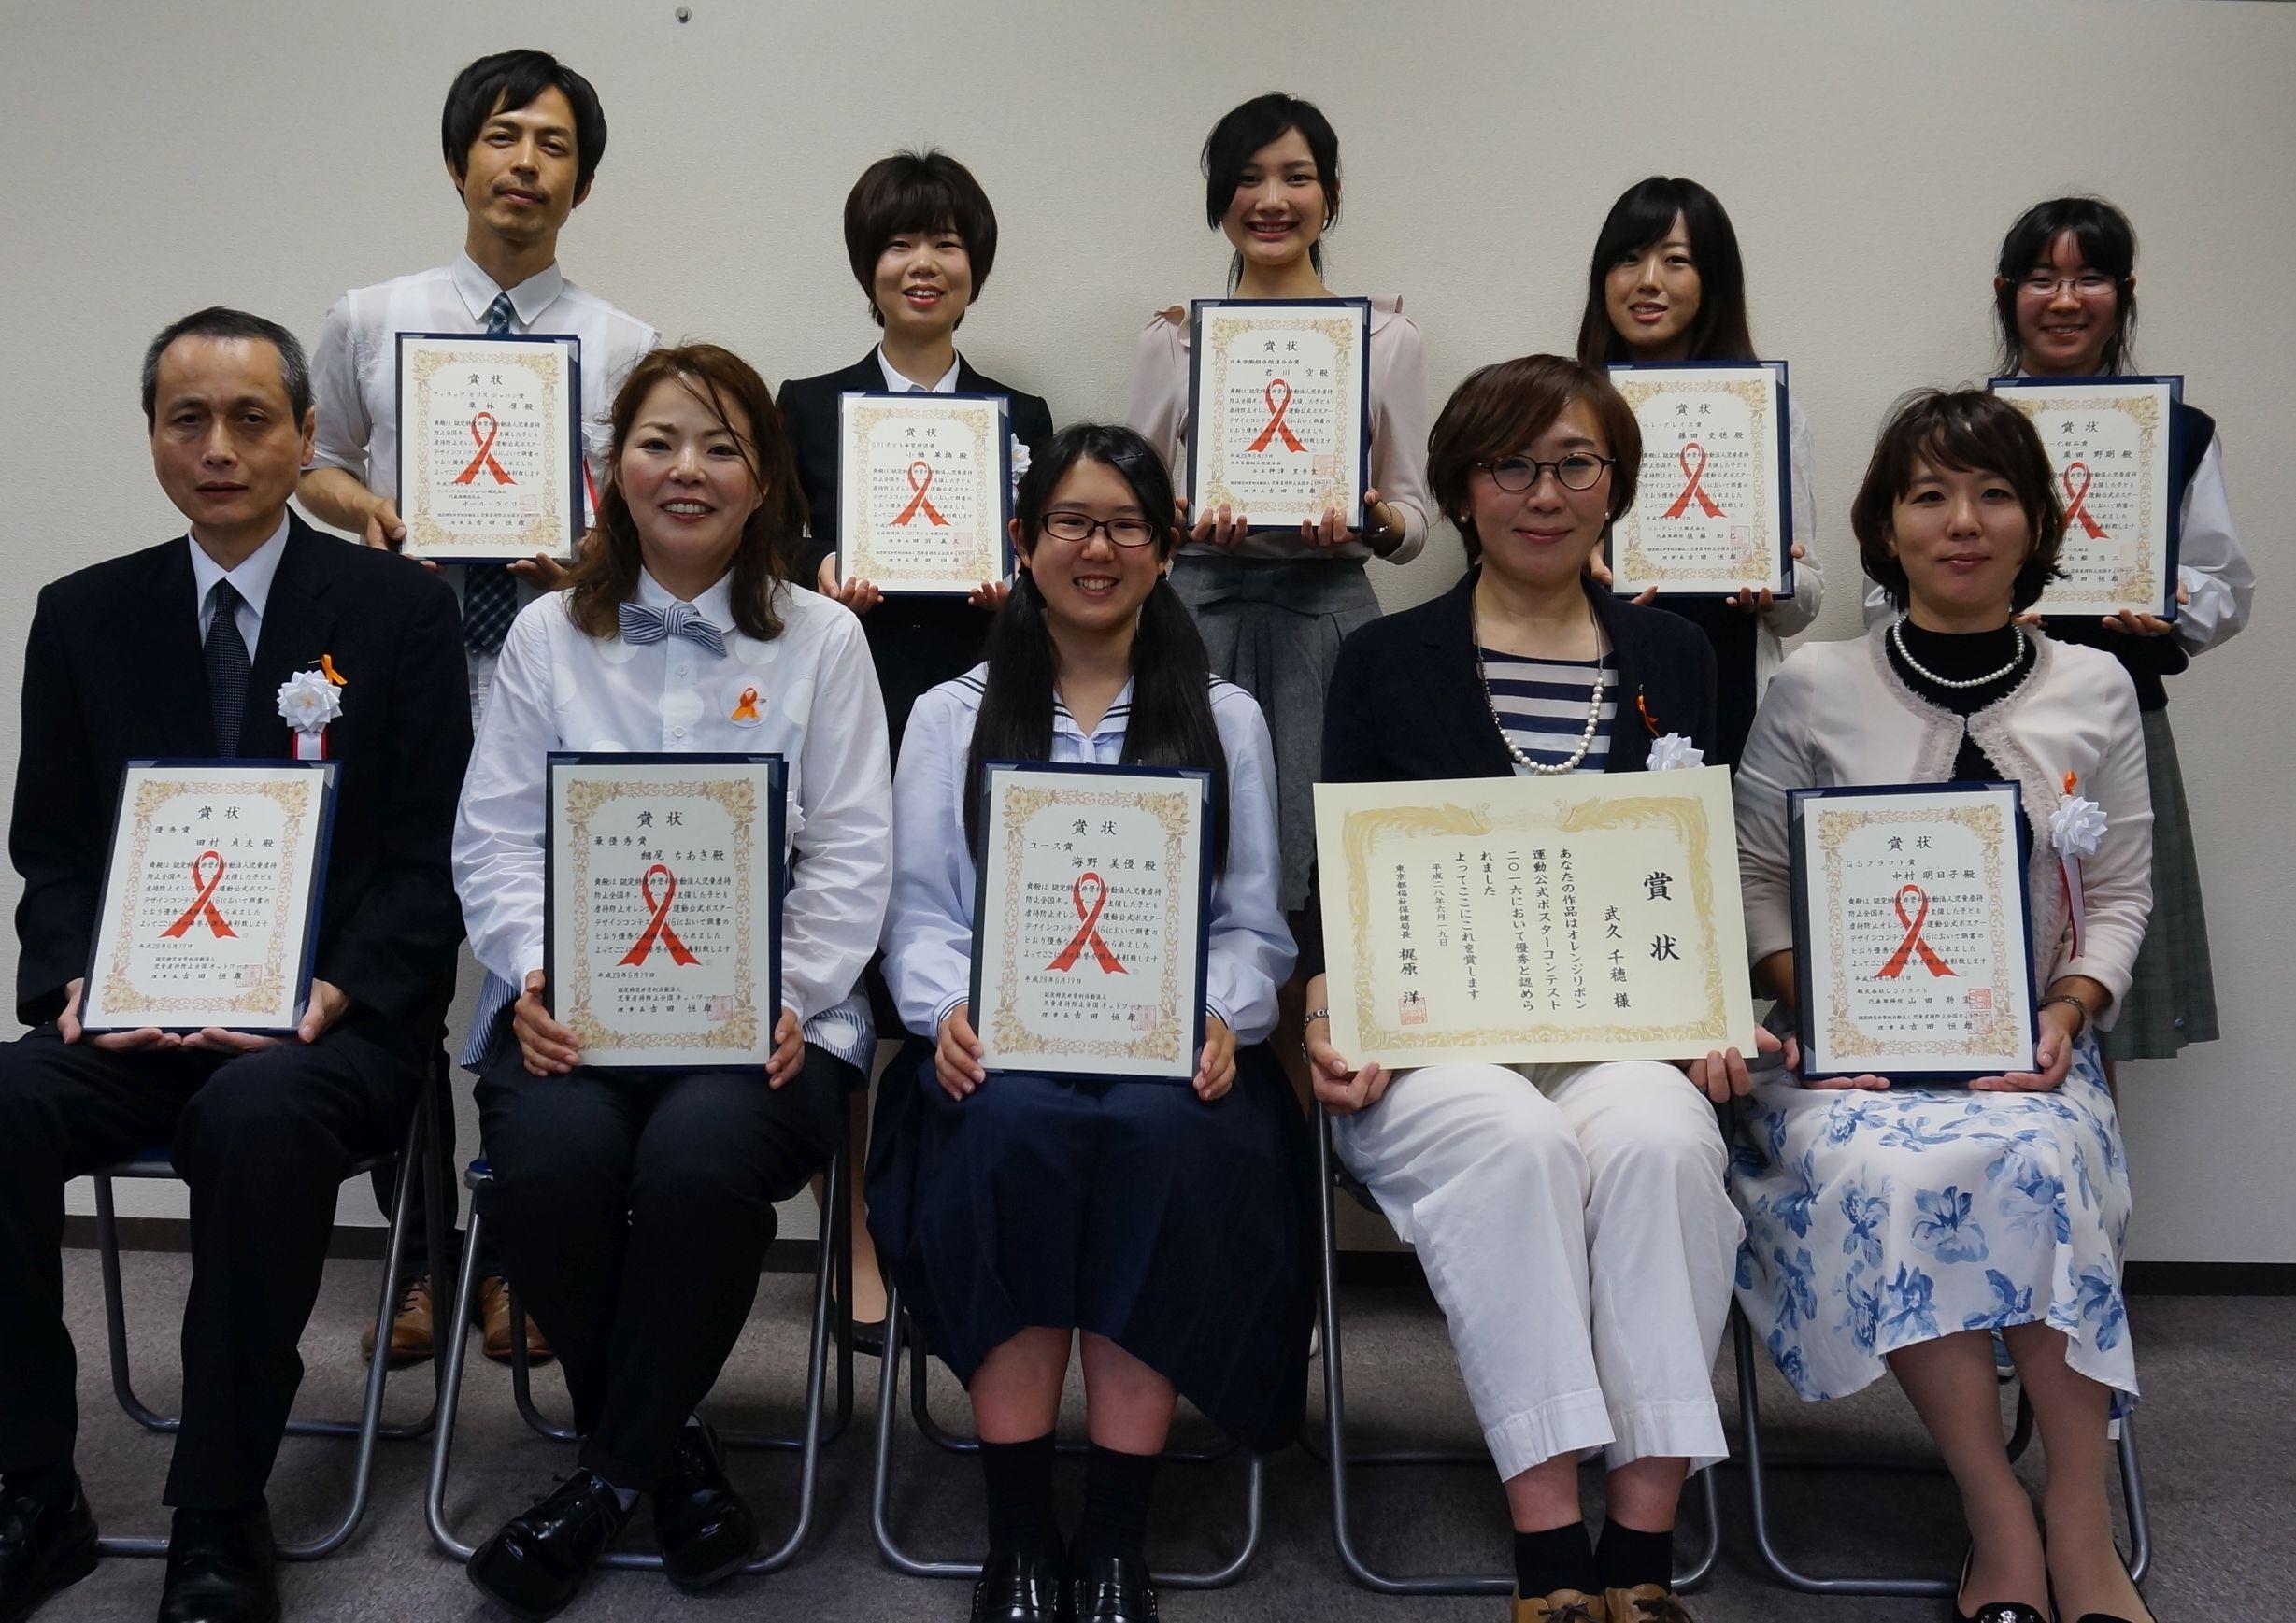 http://www.orangeribbon.jp/info/npo/contest/image/jushoshiki.jpg